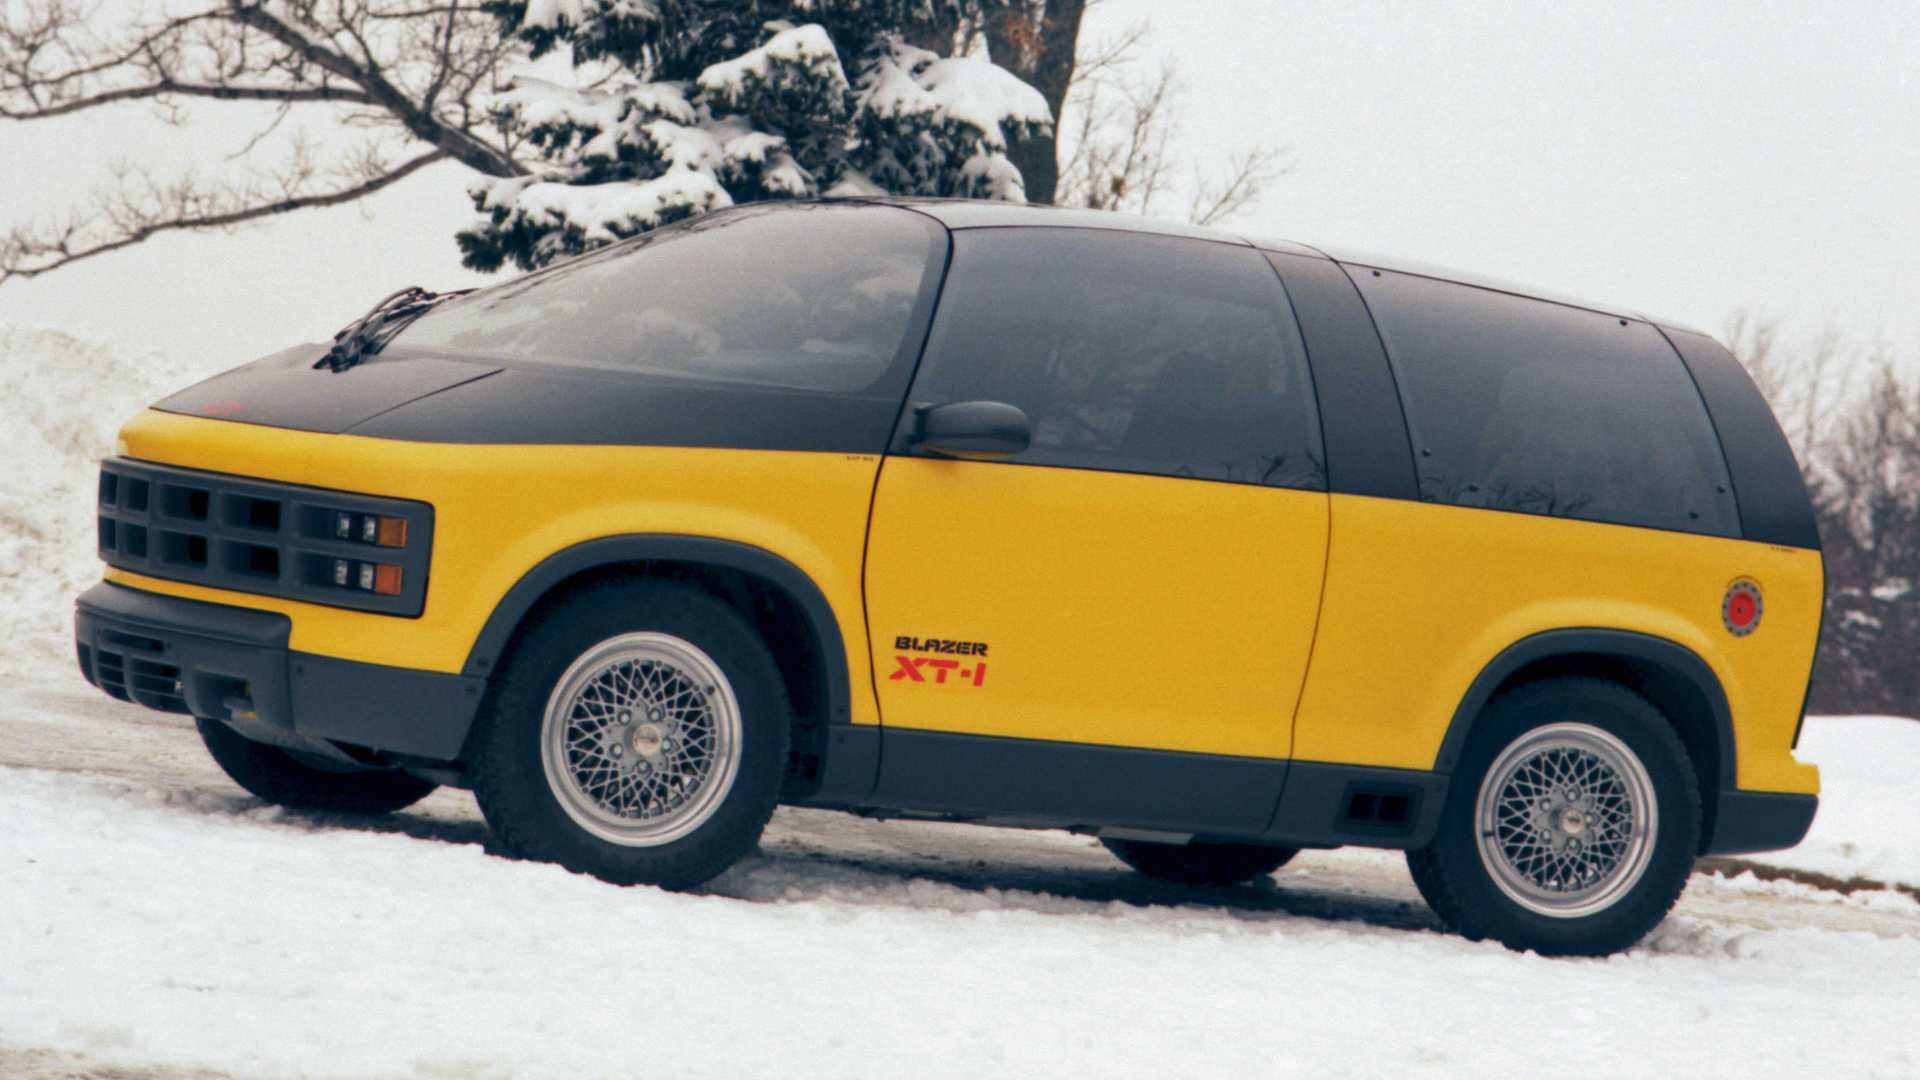 2020 Chevrolet Blazer K-5 Photos